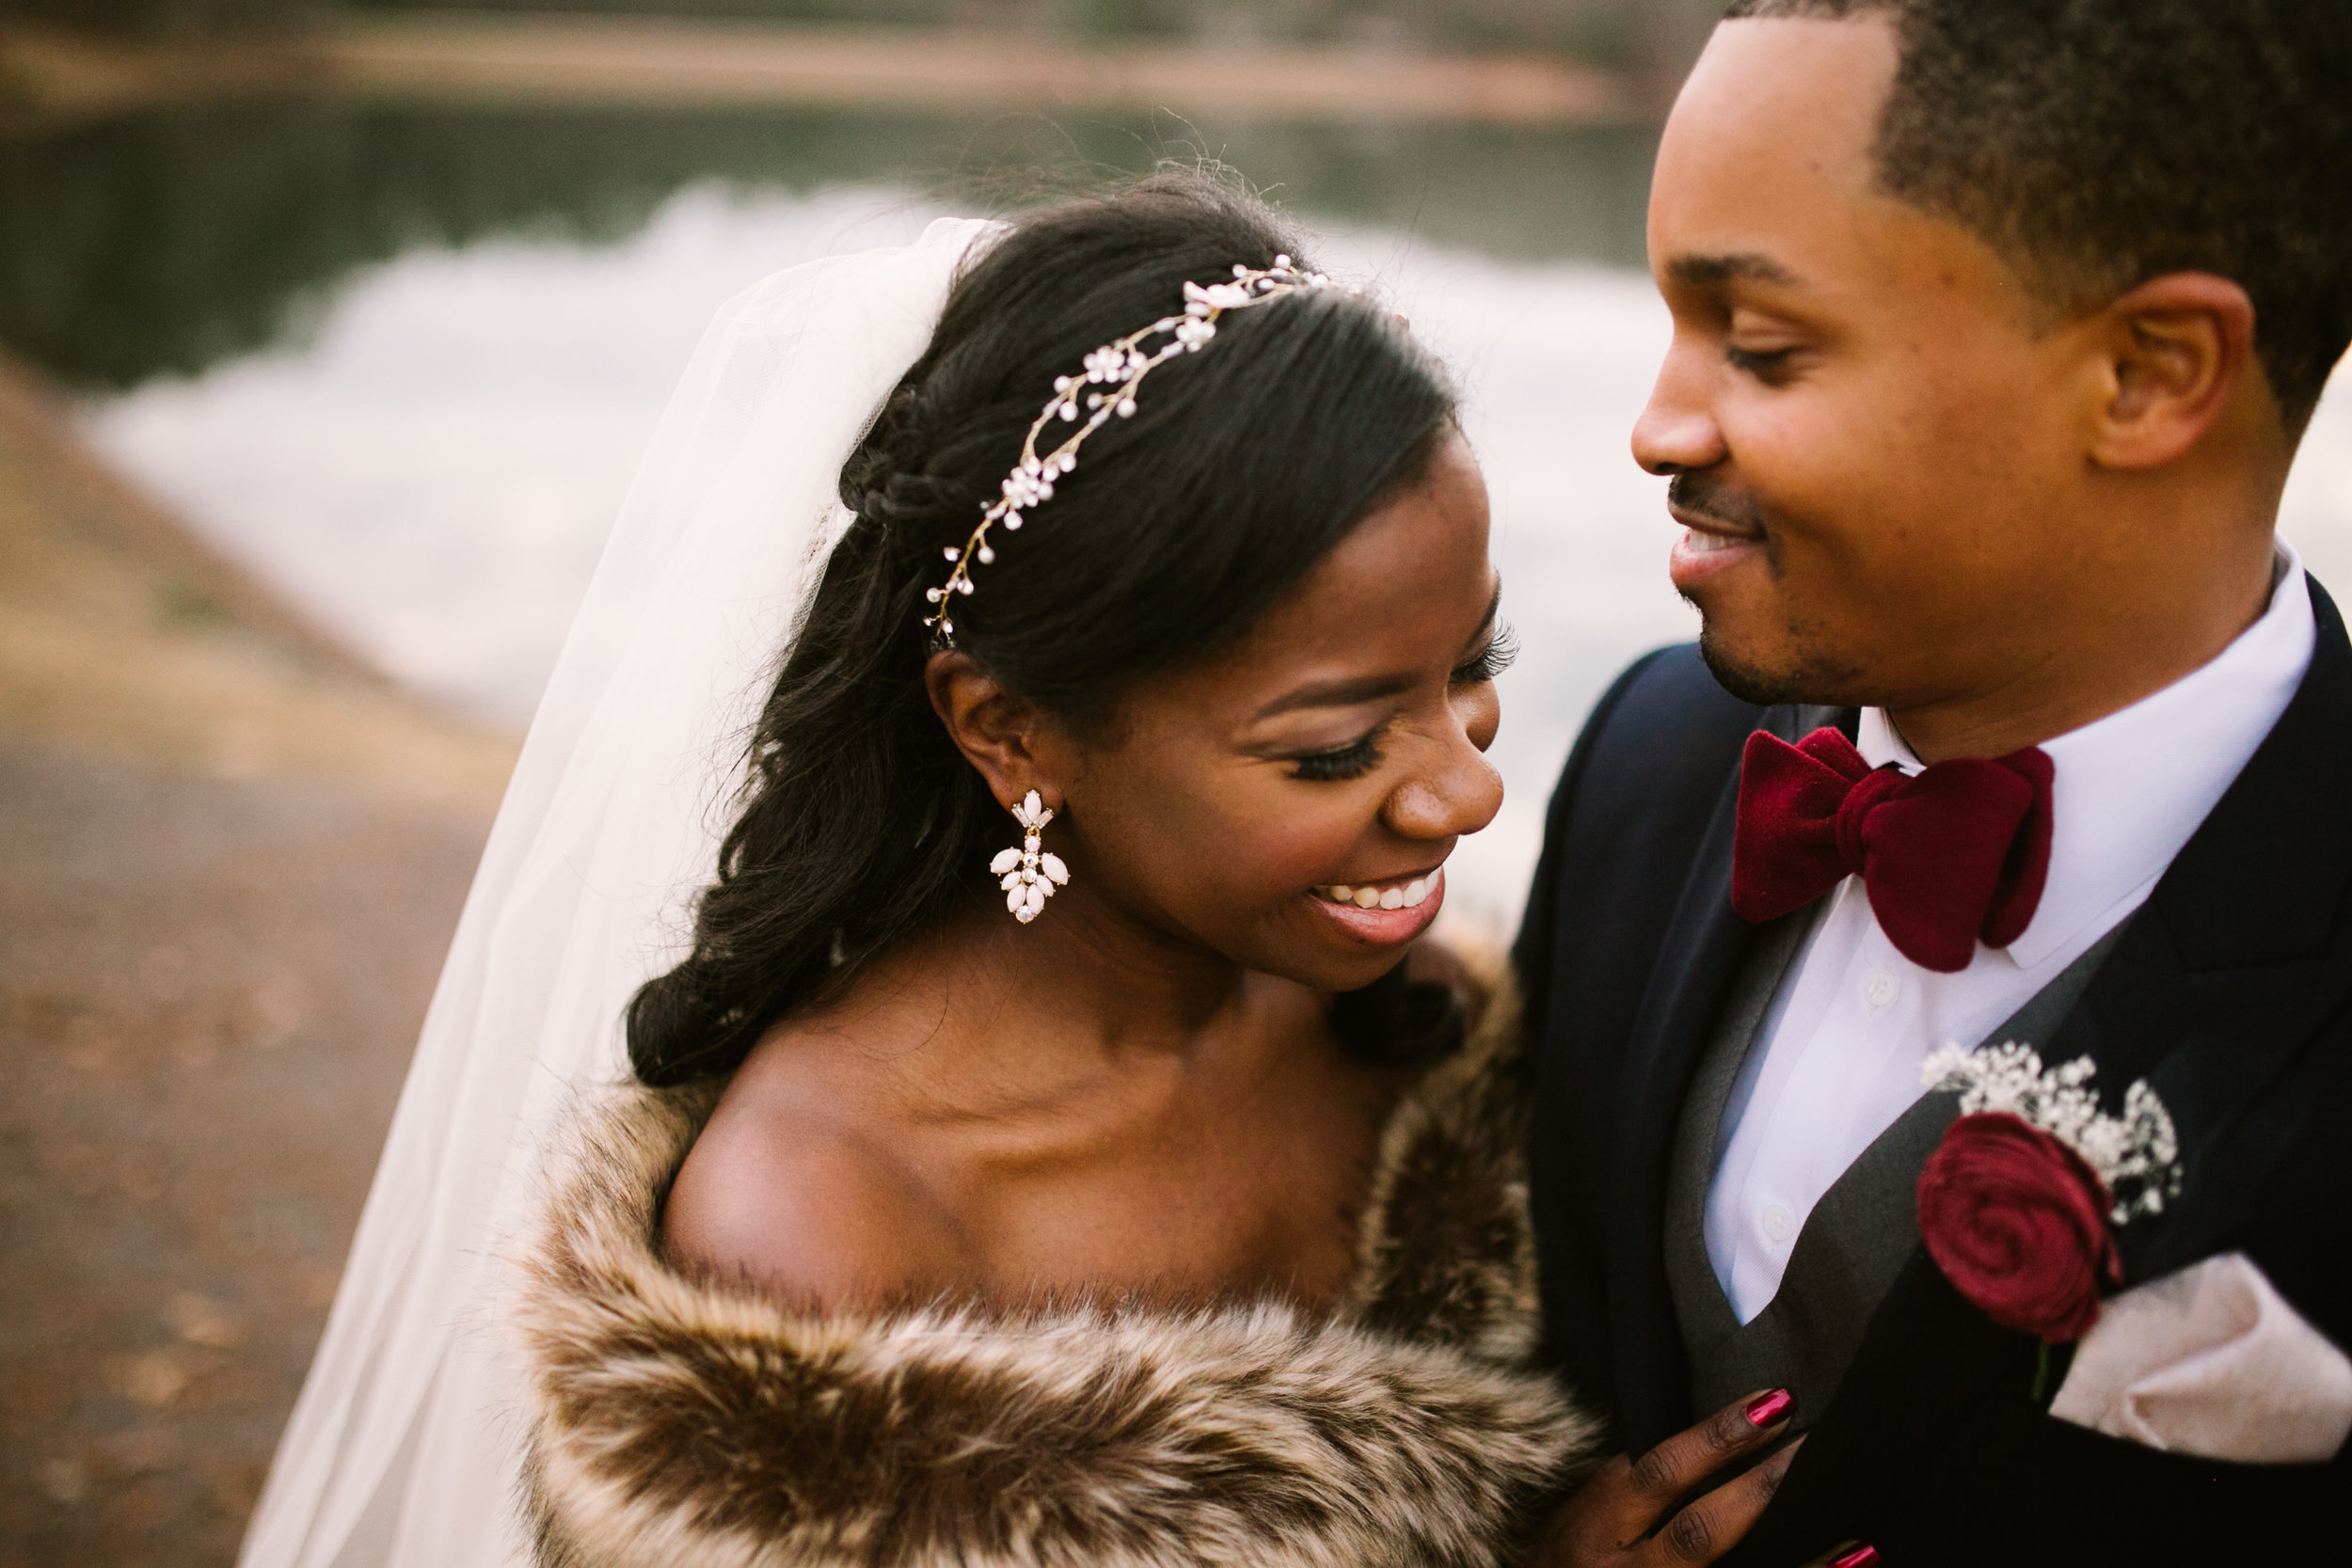 foxhall-resort-wedding-00033.jpg